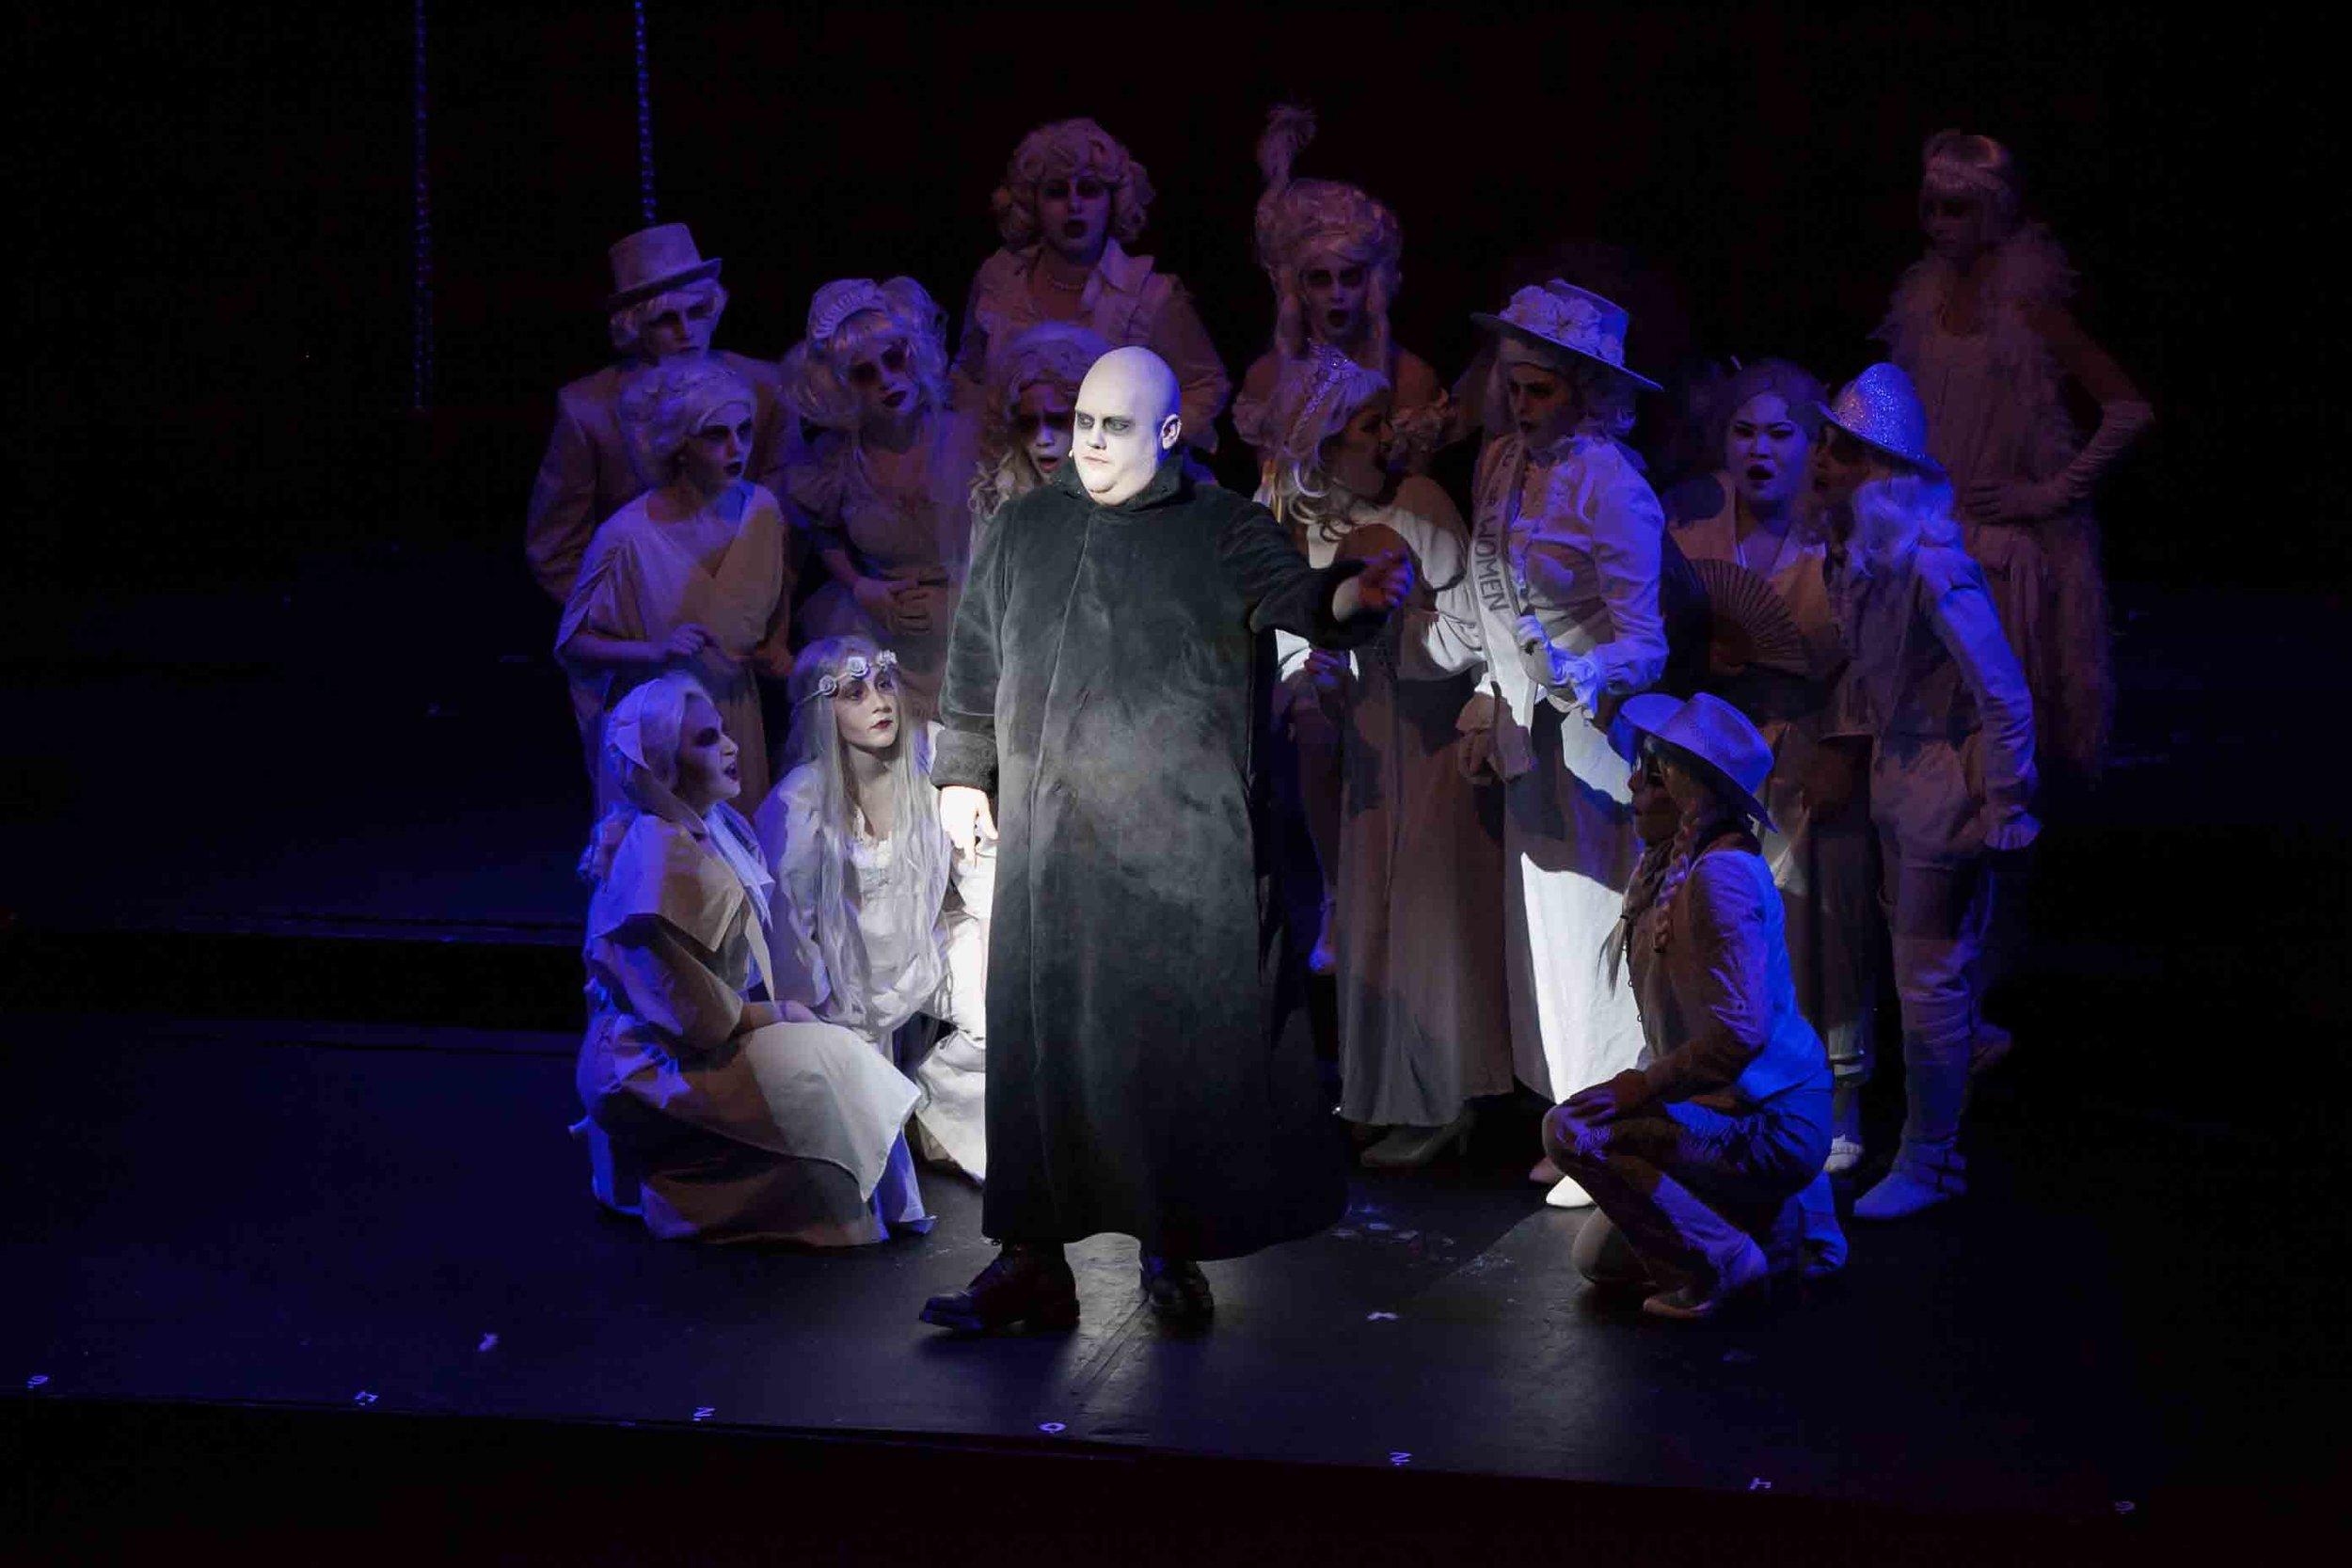 6-19-16 Addams Family Creepy Cast 0061.jpg